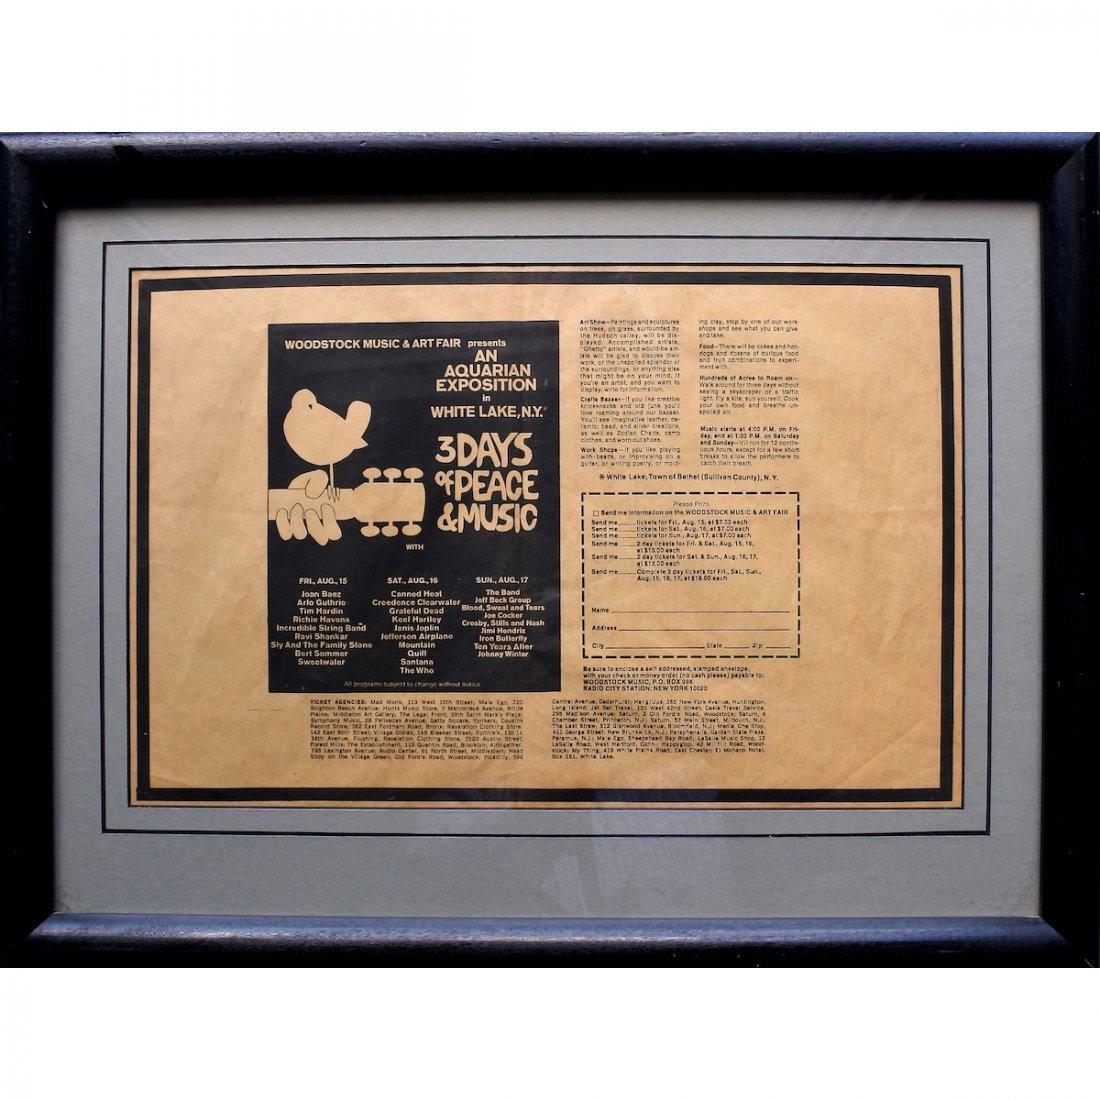 Woodstock - 1969 Newspaper Ticket Order Form